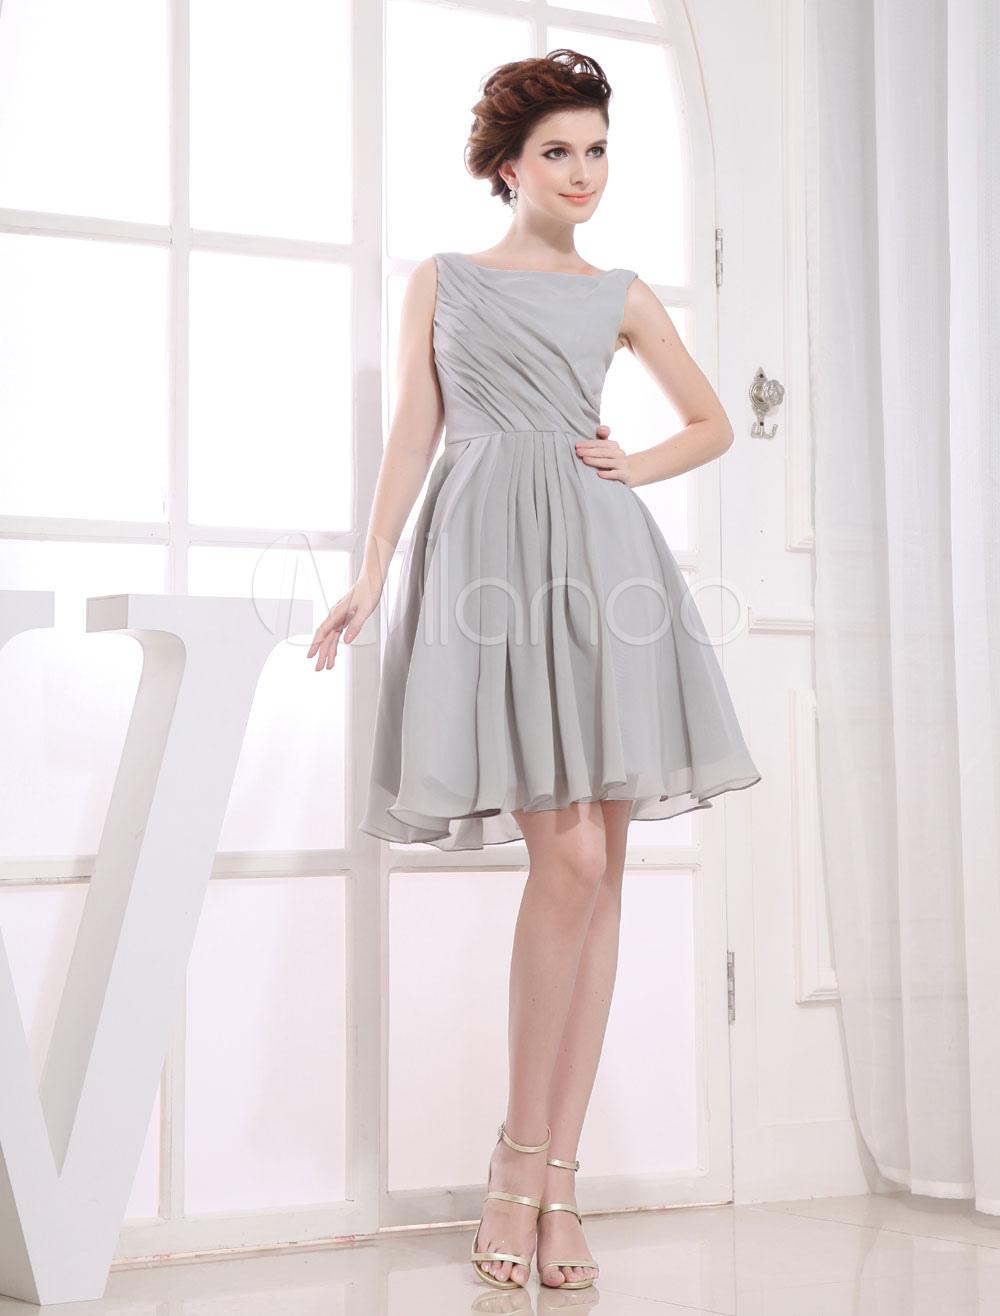 Short Bridesmaid Dress Bateau Chiffon Pleated A-Line Party Dress